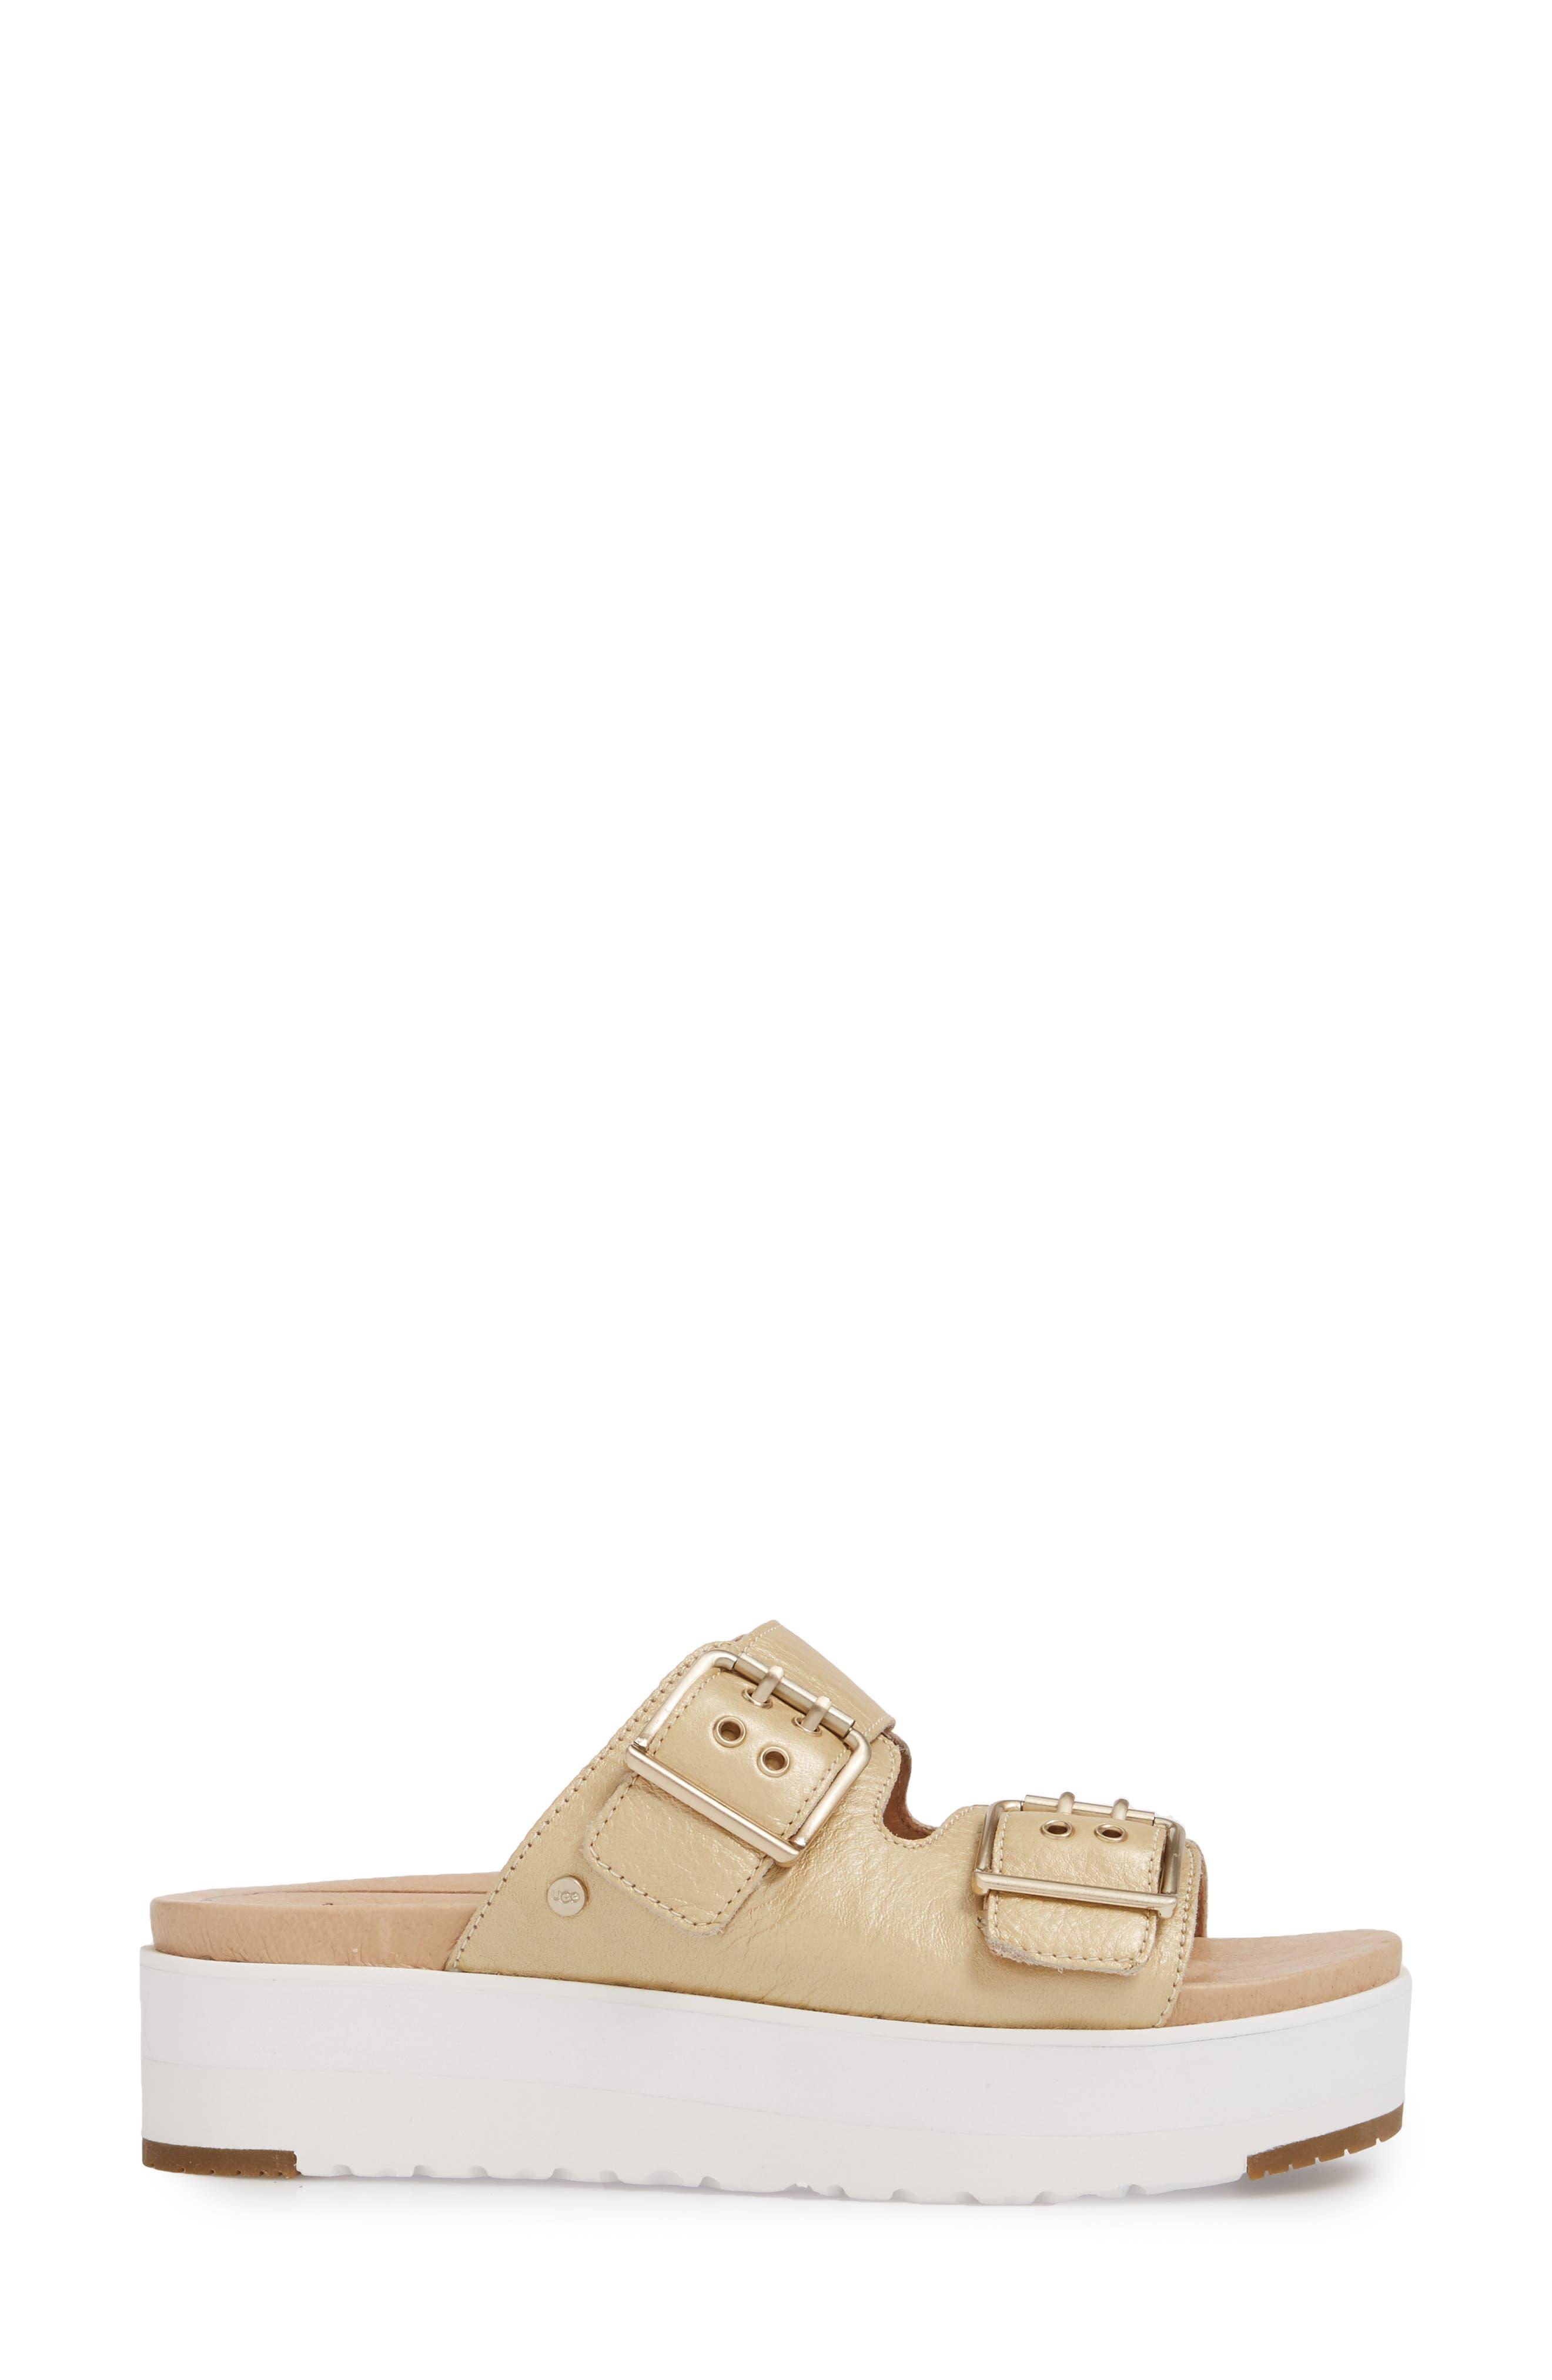 Cammie Platform Sandal,                             Alternate thumbnail 3, color,                             Gold Patent Leather